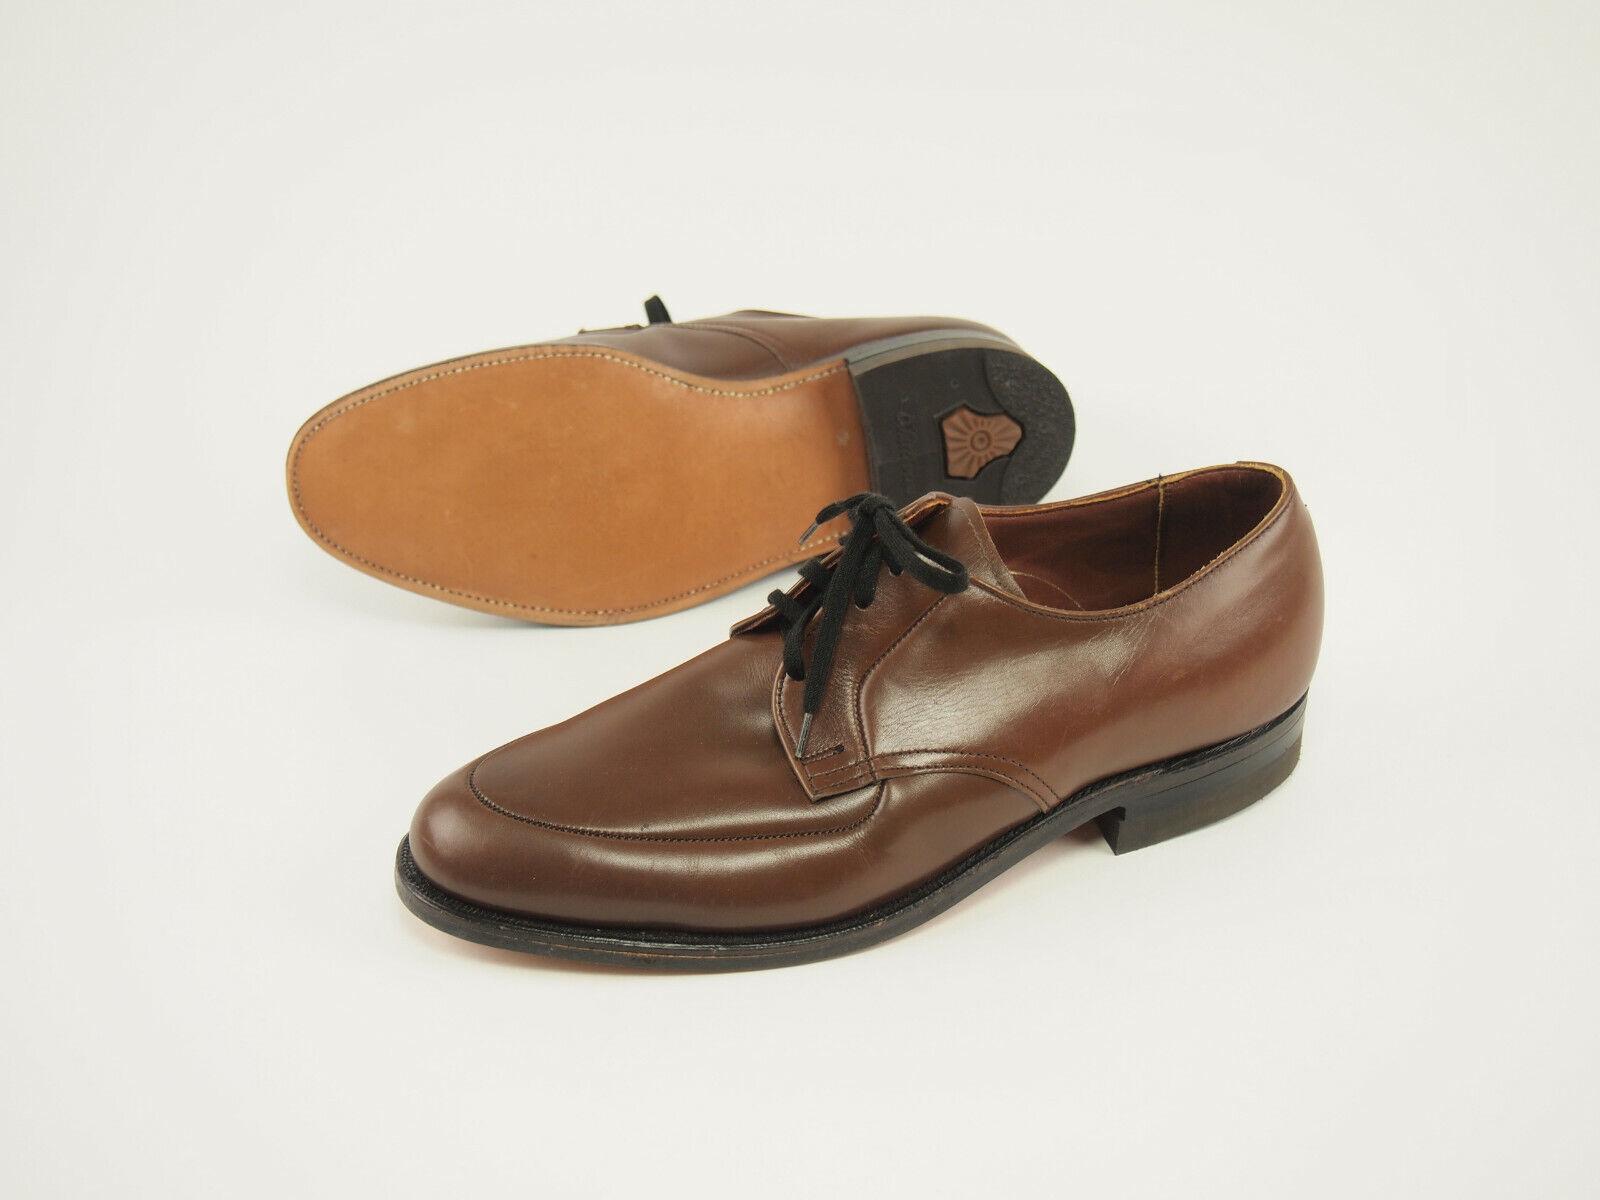 New MASON Vintage 80s Brown Leather Dress Oxfords 8 D